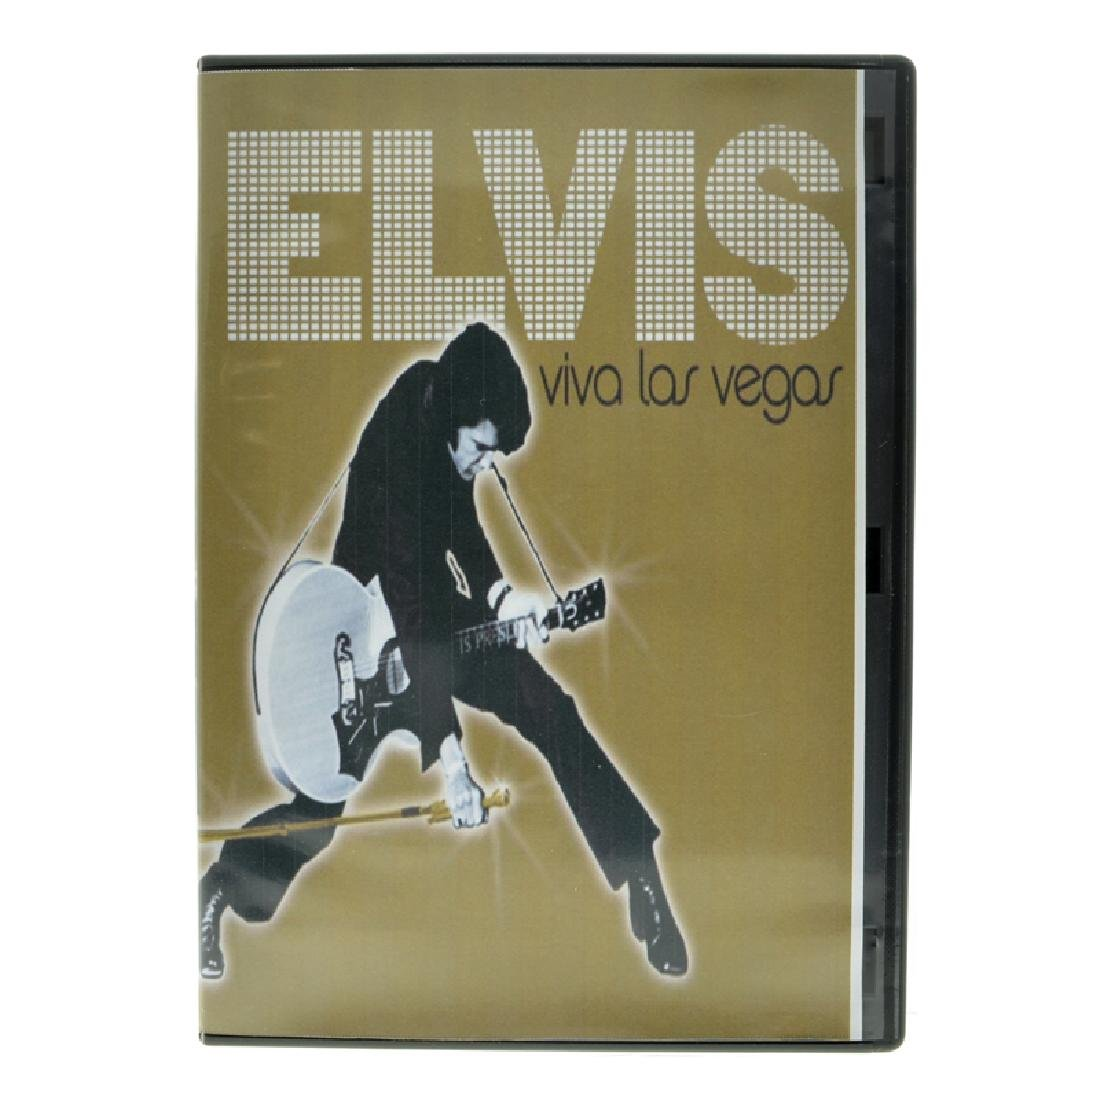 Elvis Presley Movie: Elvis Viva Las Vegas